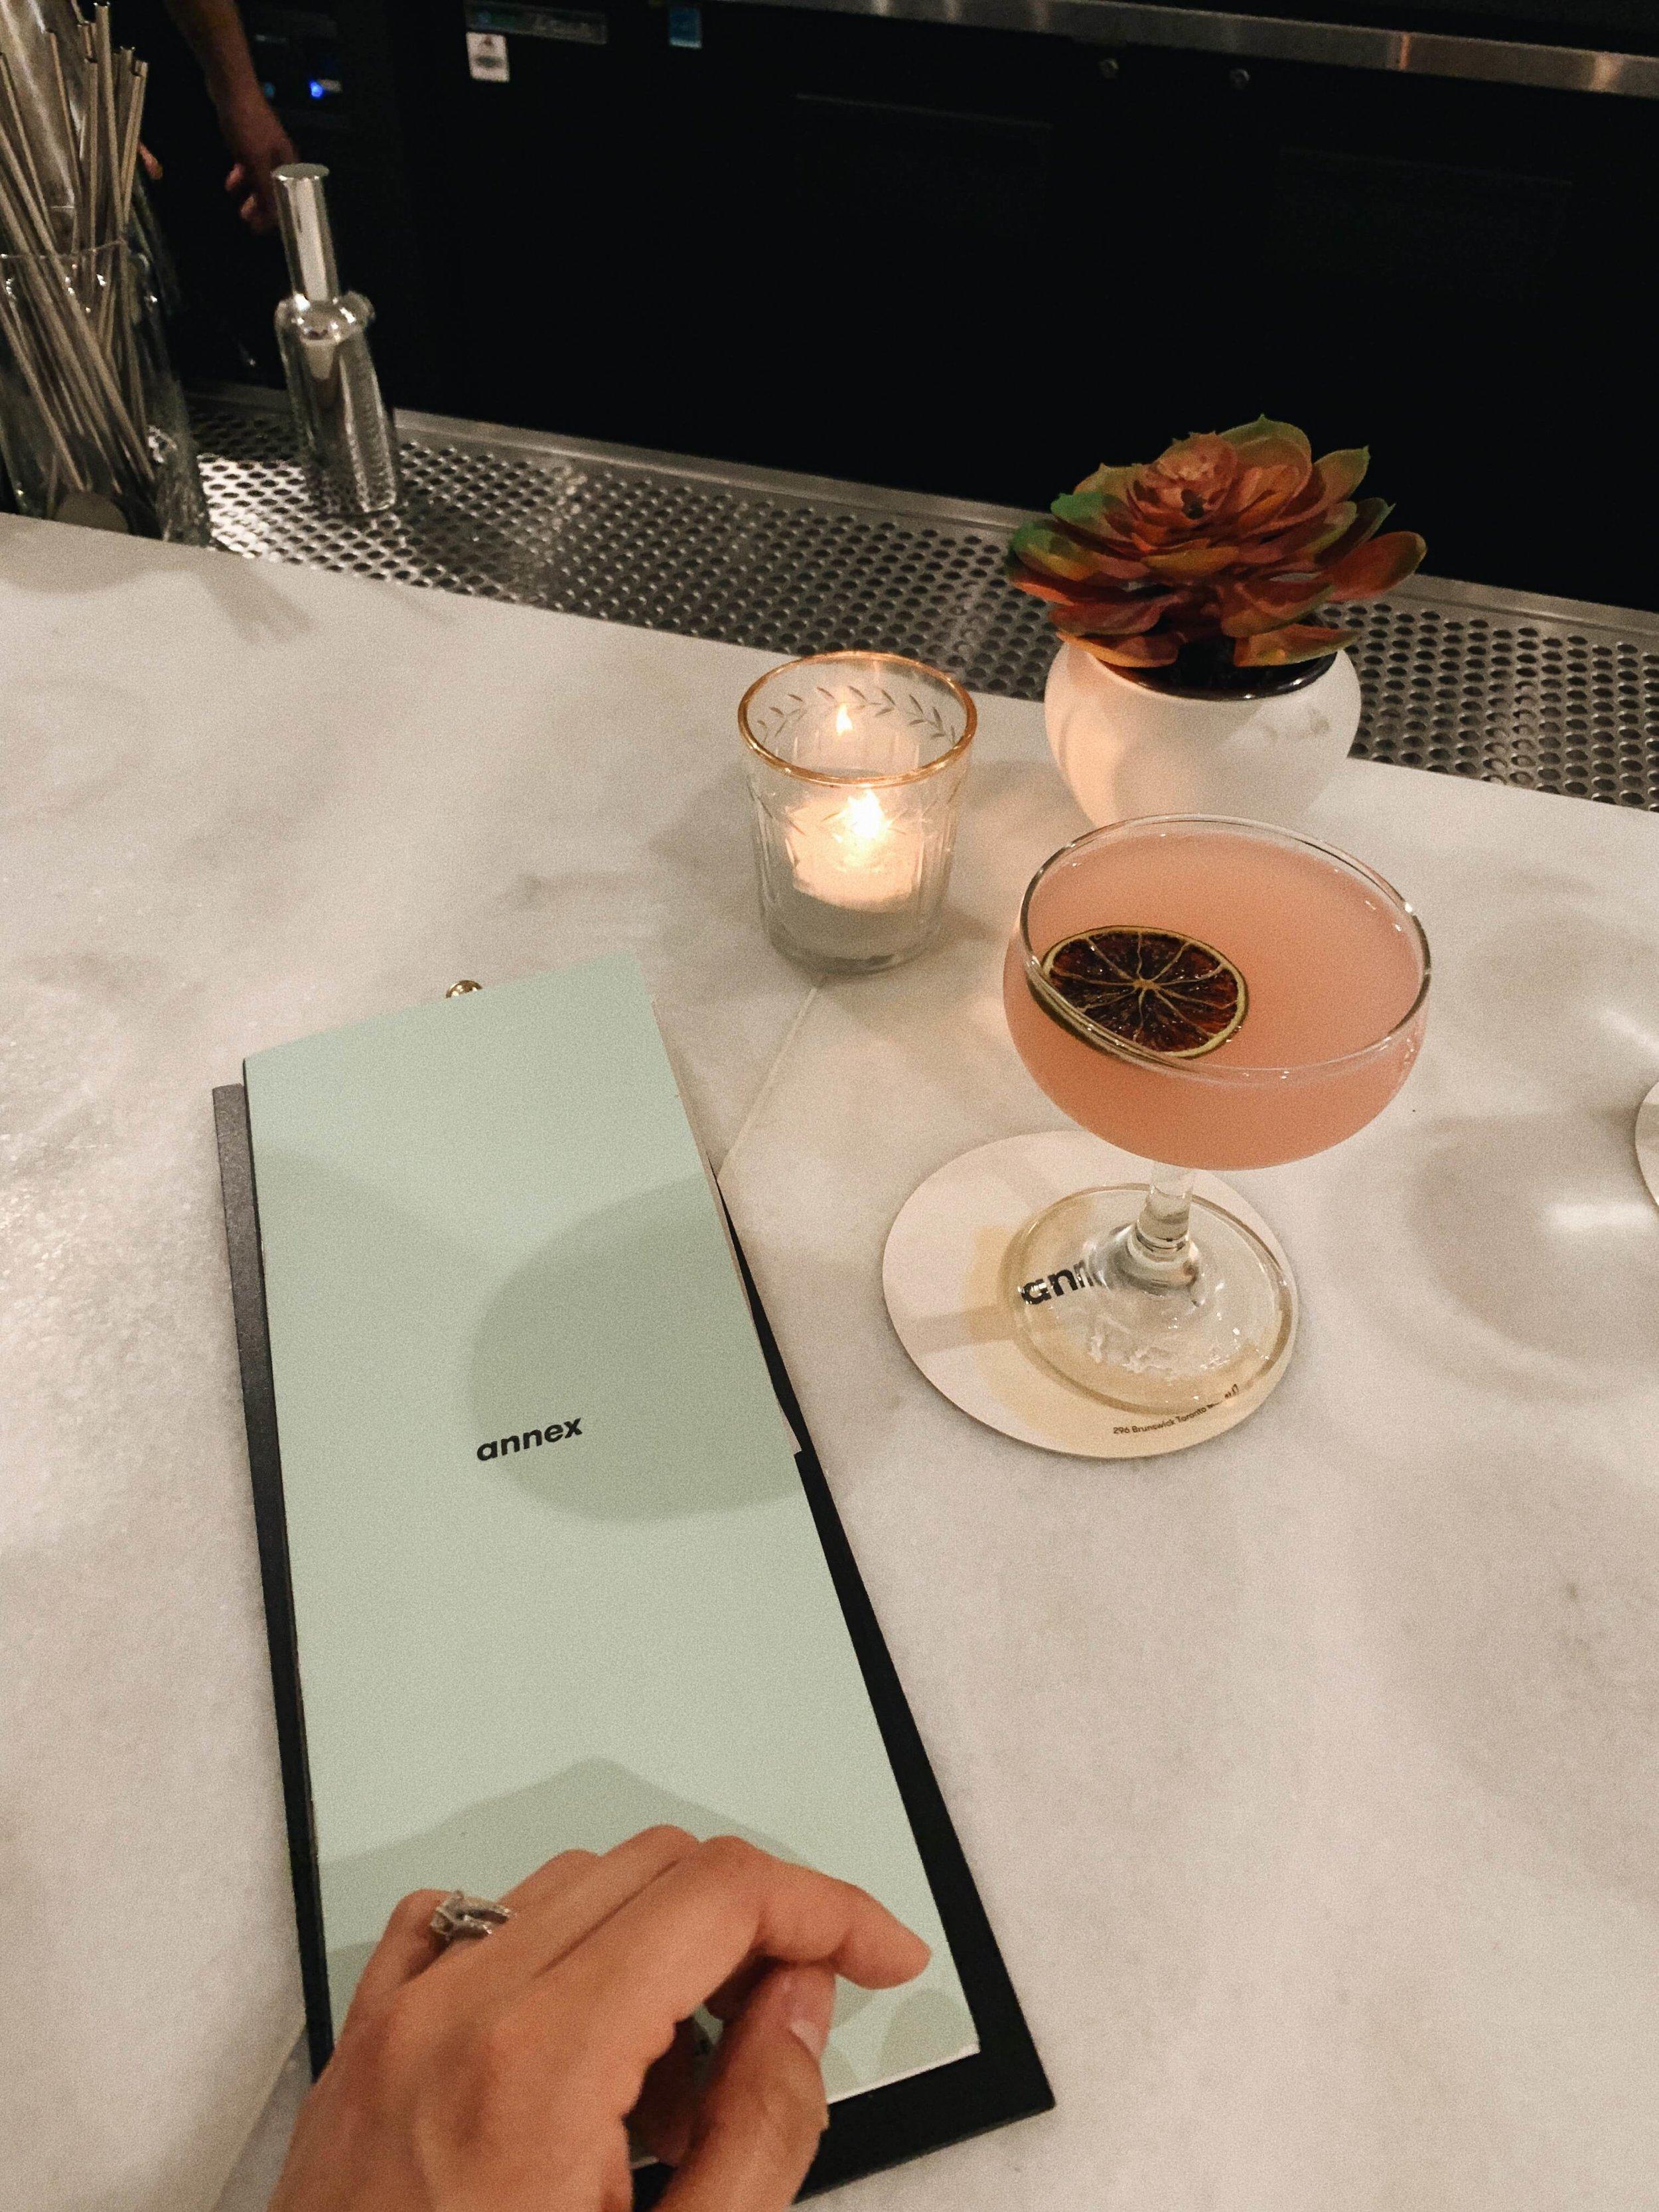 taraleighrose-annex-hotel-lifestyle-influencer-toronto-creator-cocktail (1).JPG